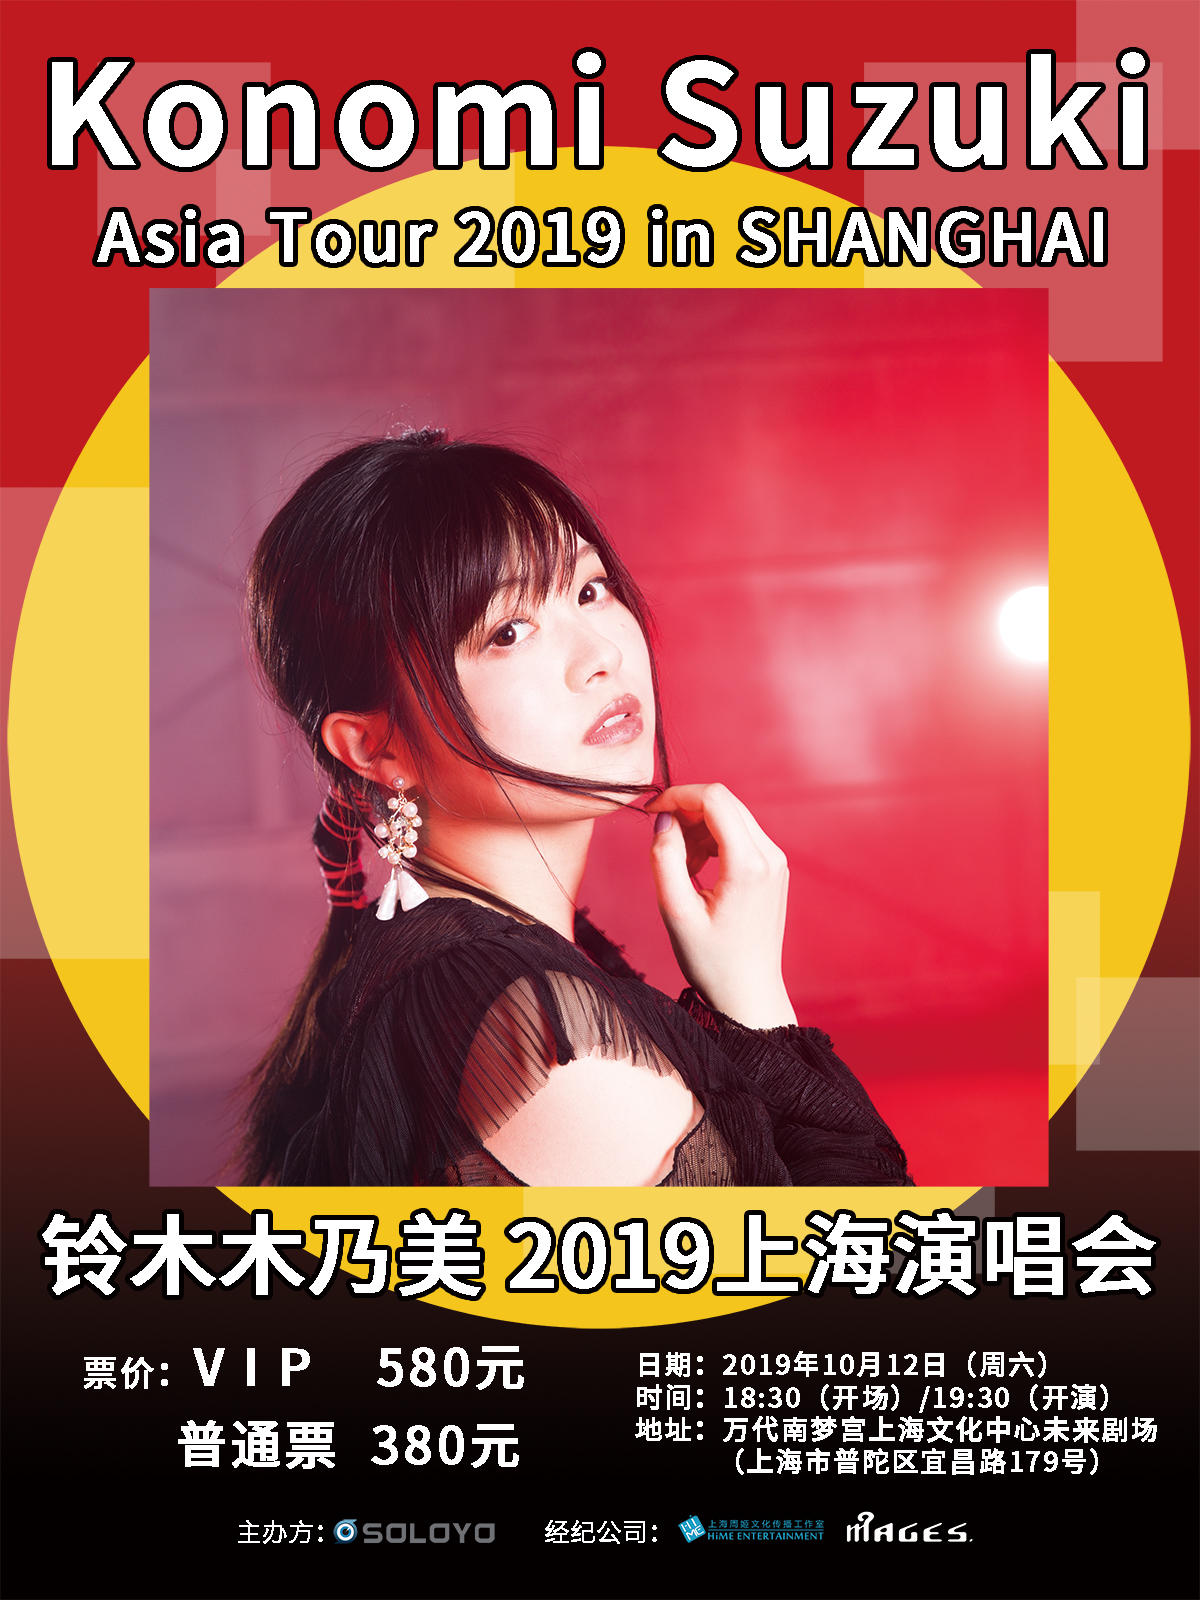 [2019/10/12] Konomi Suzuki Asia Tour 2019 in SHANGHAI